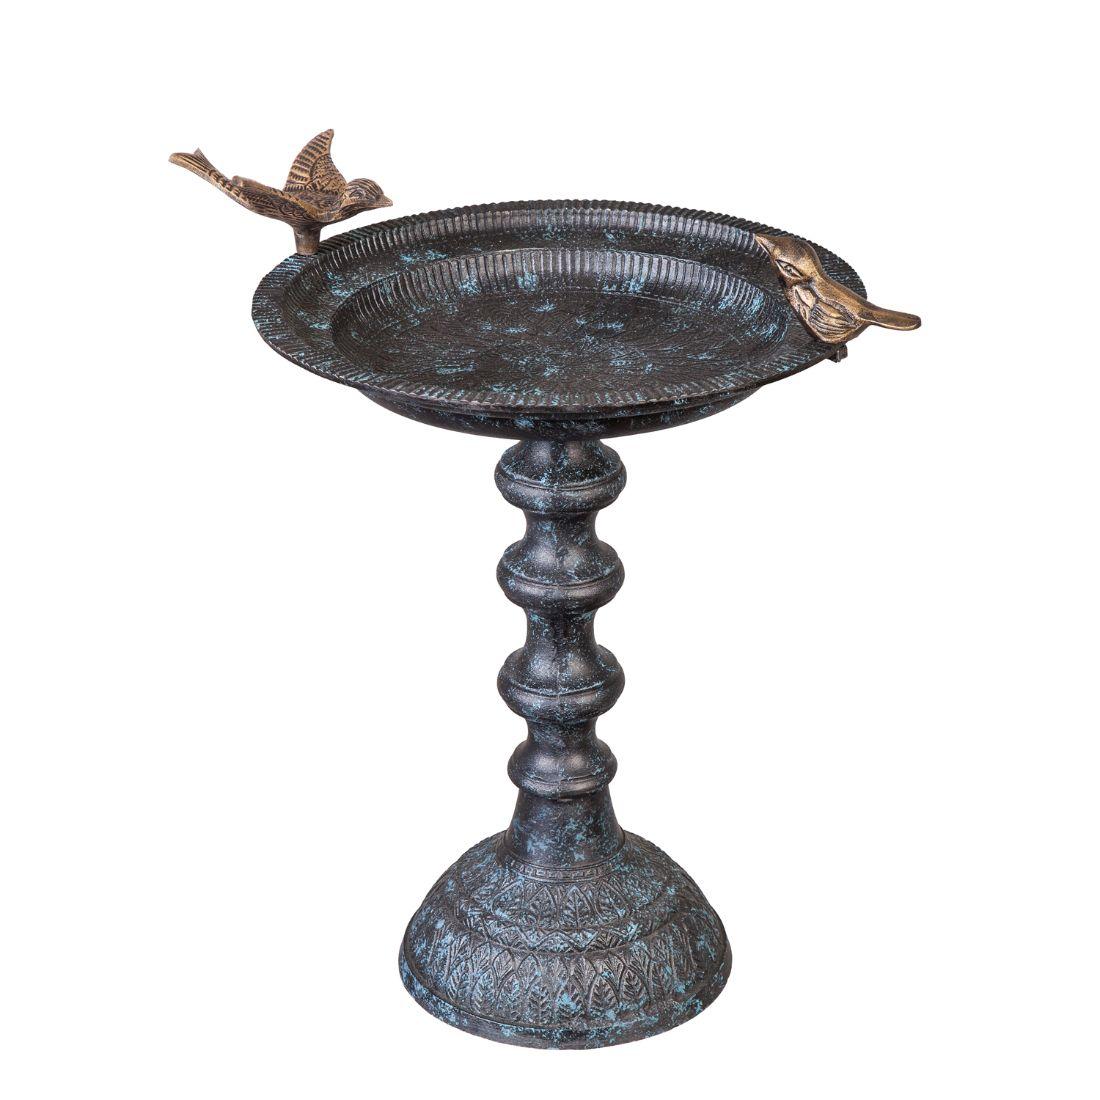 Cast Metal Bird Bath on Pedestal